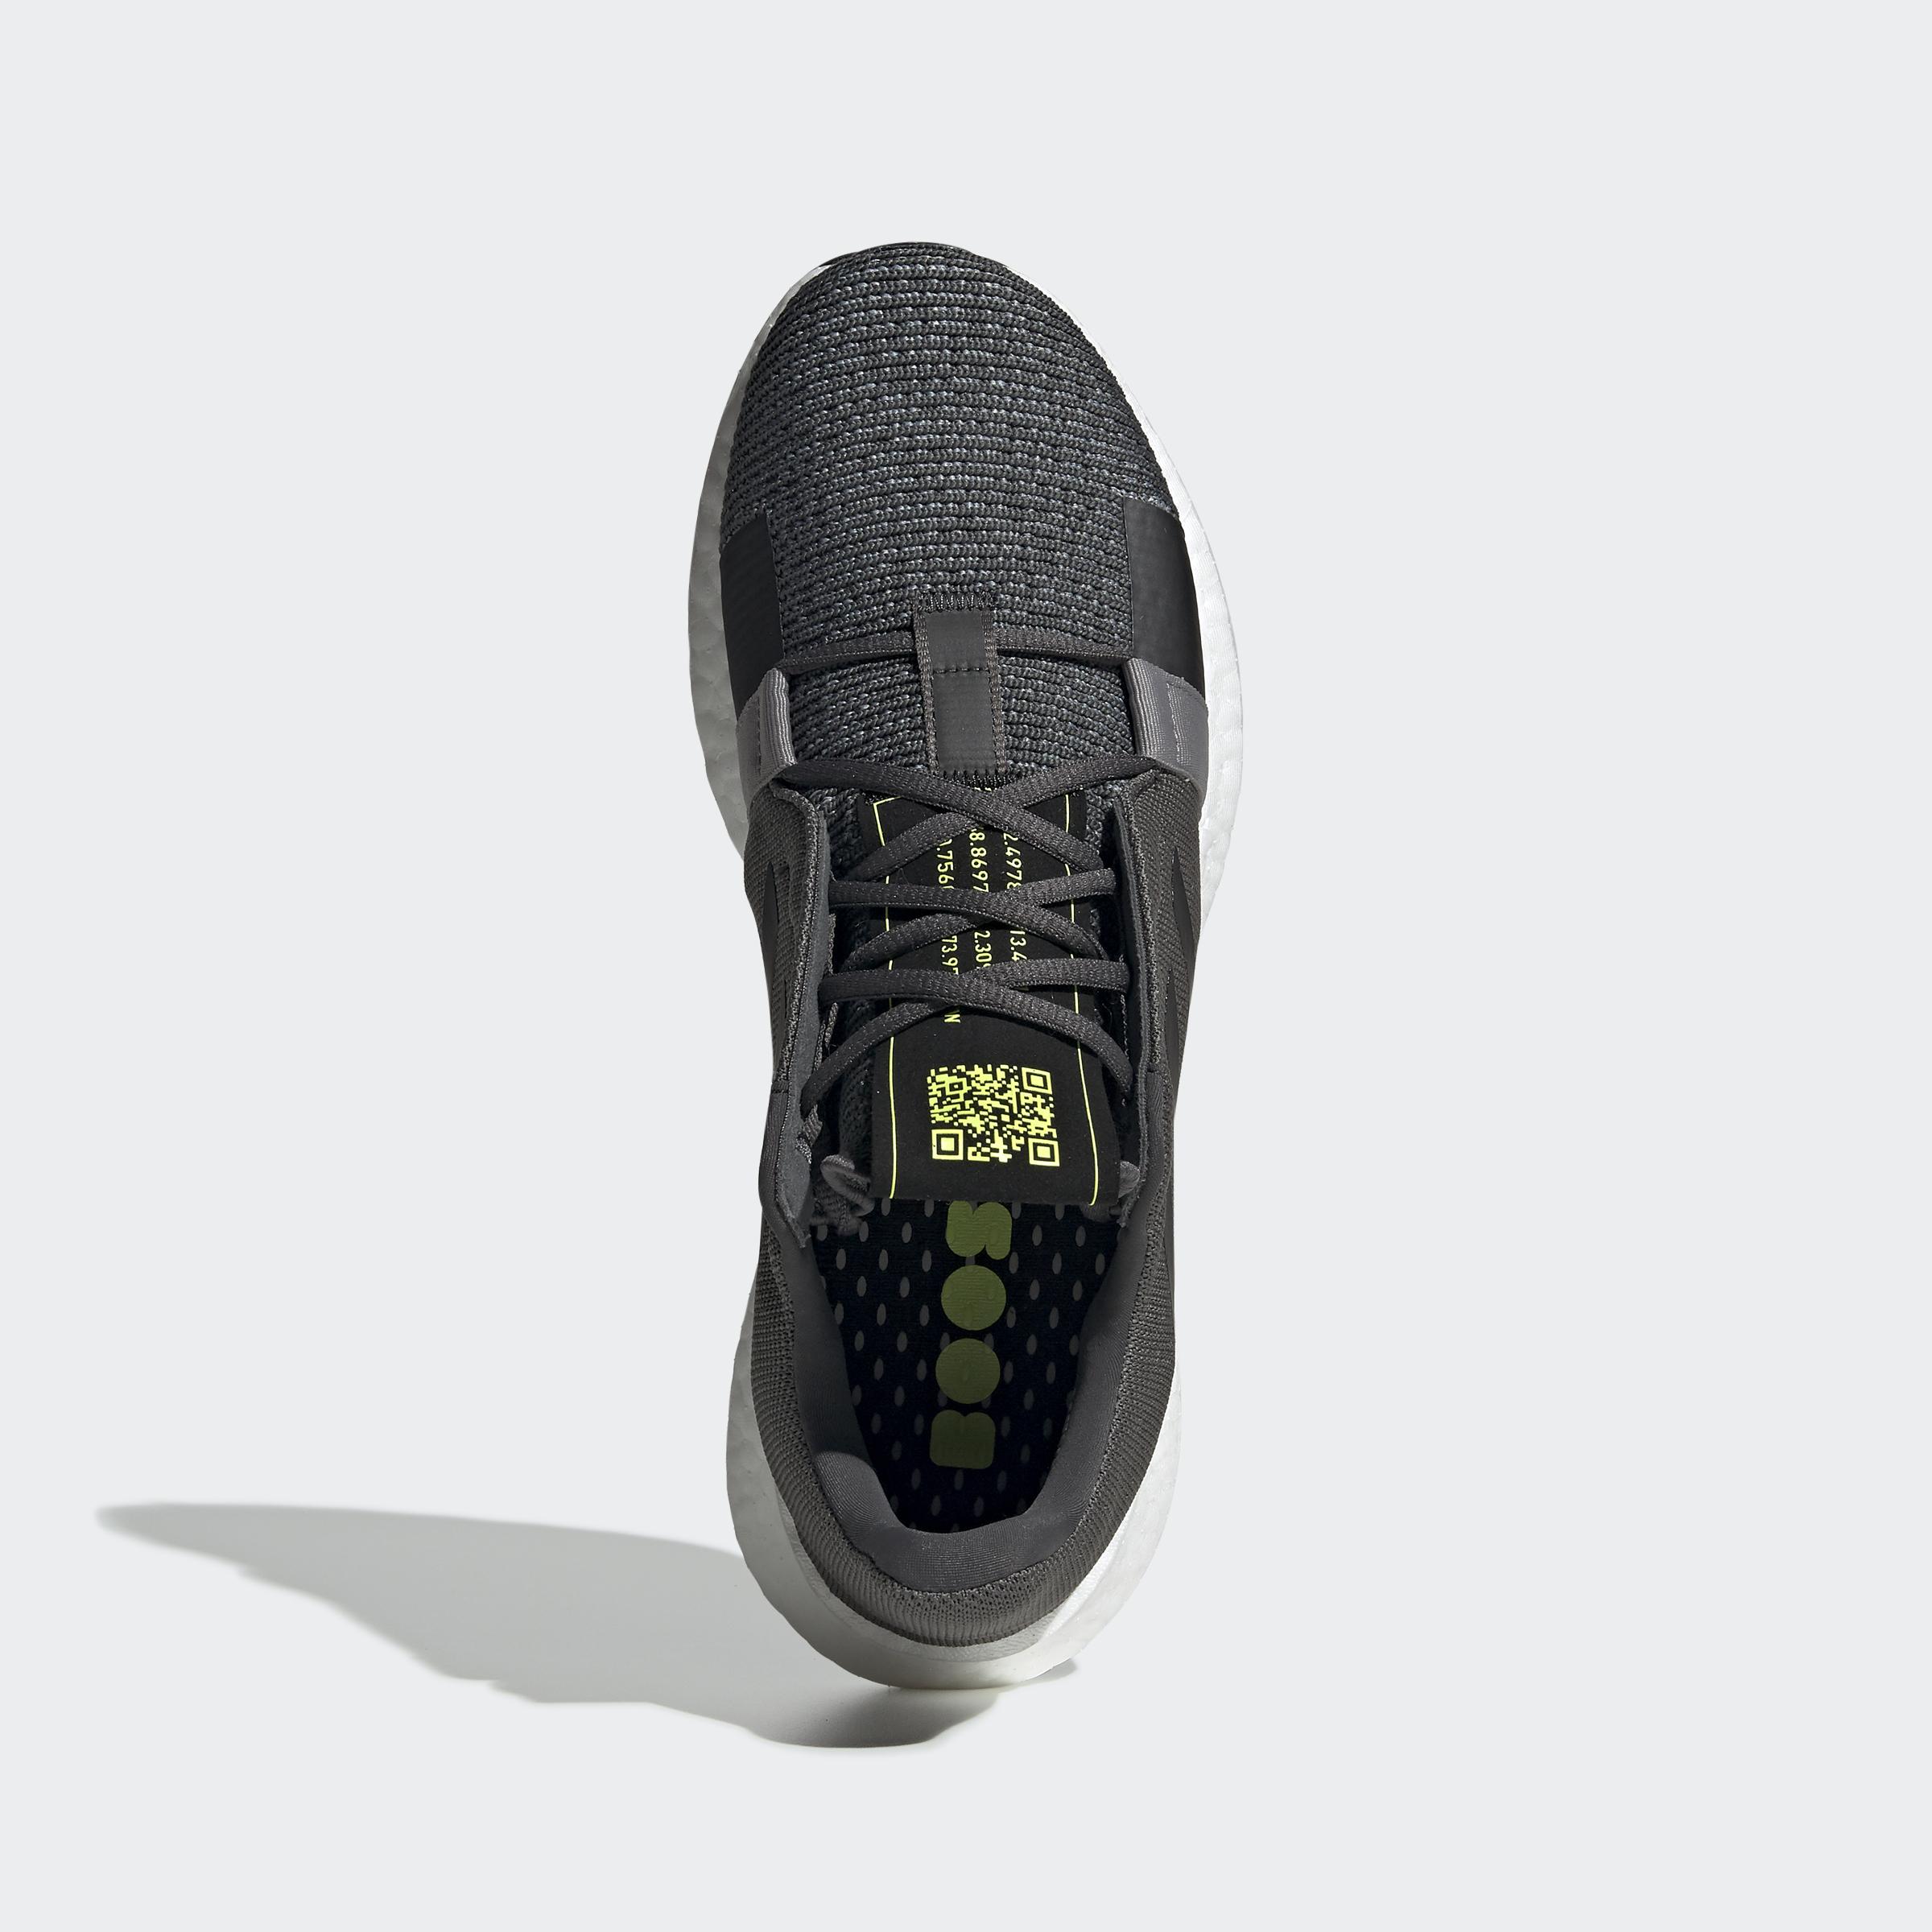 miniature 14 - adidas Senseboost Go Shoes Men's Athletic & Sneakers